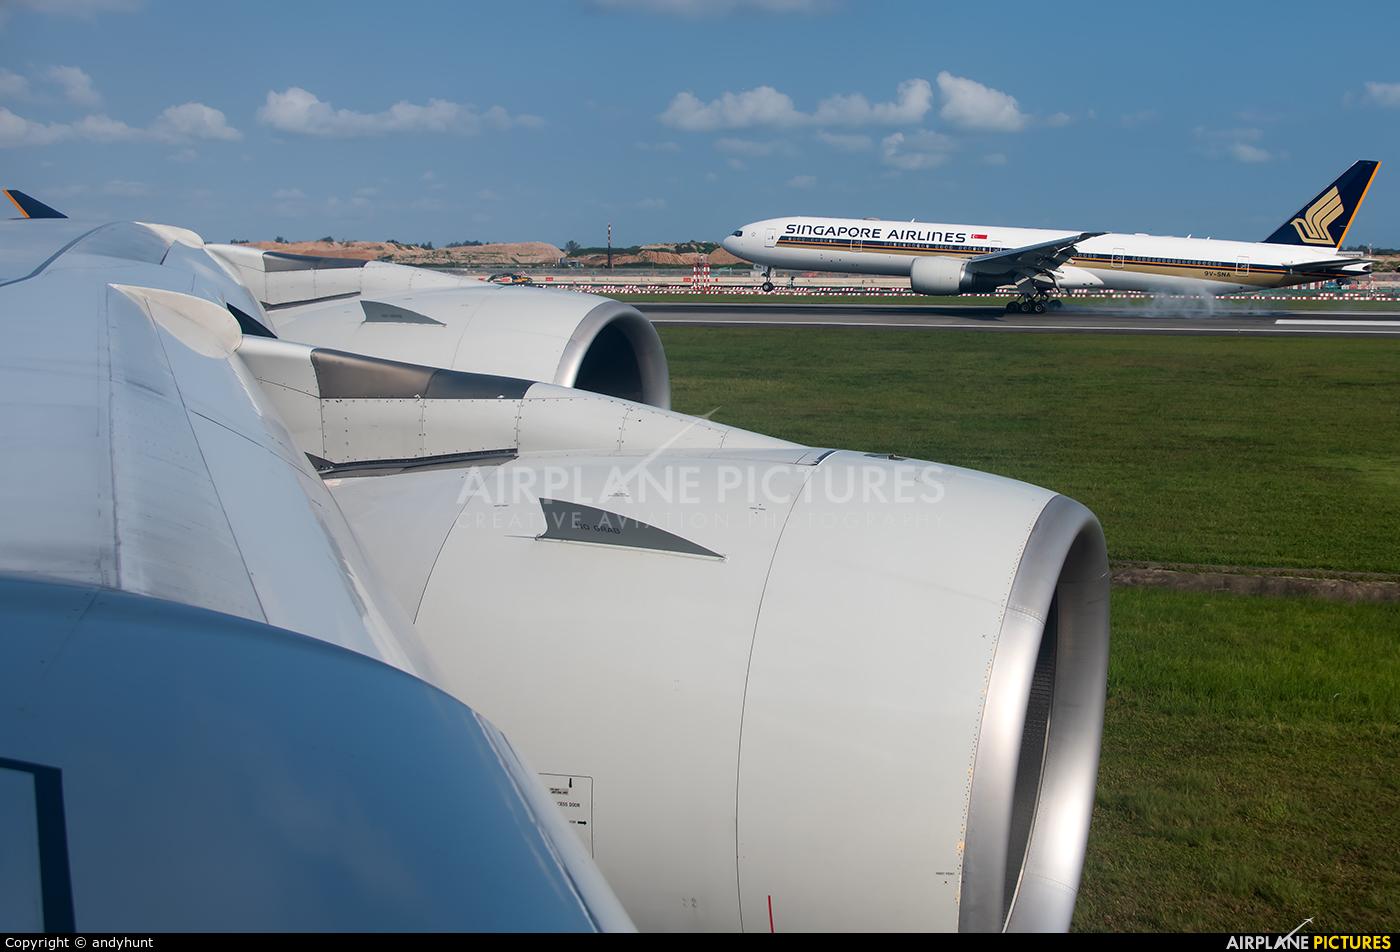 Singapore Airlines 9V-SKJ aircraft at Singapore - Changi